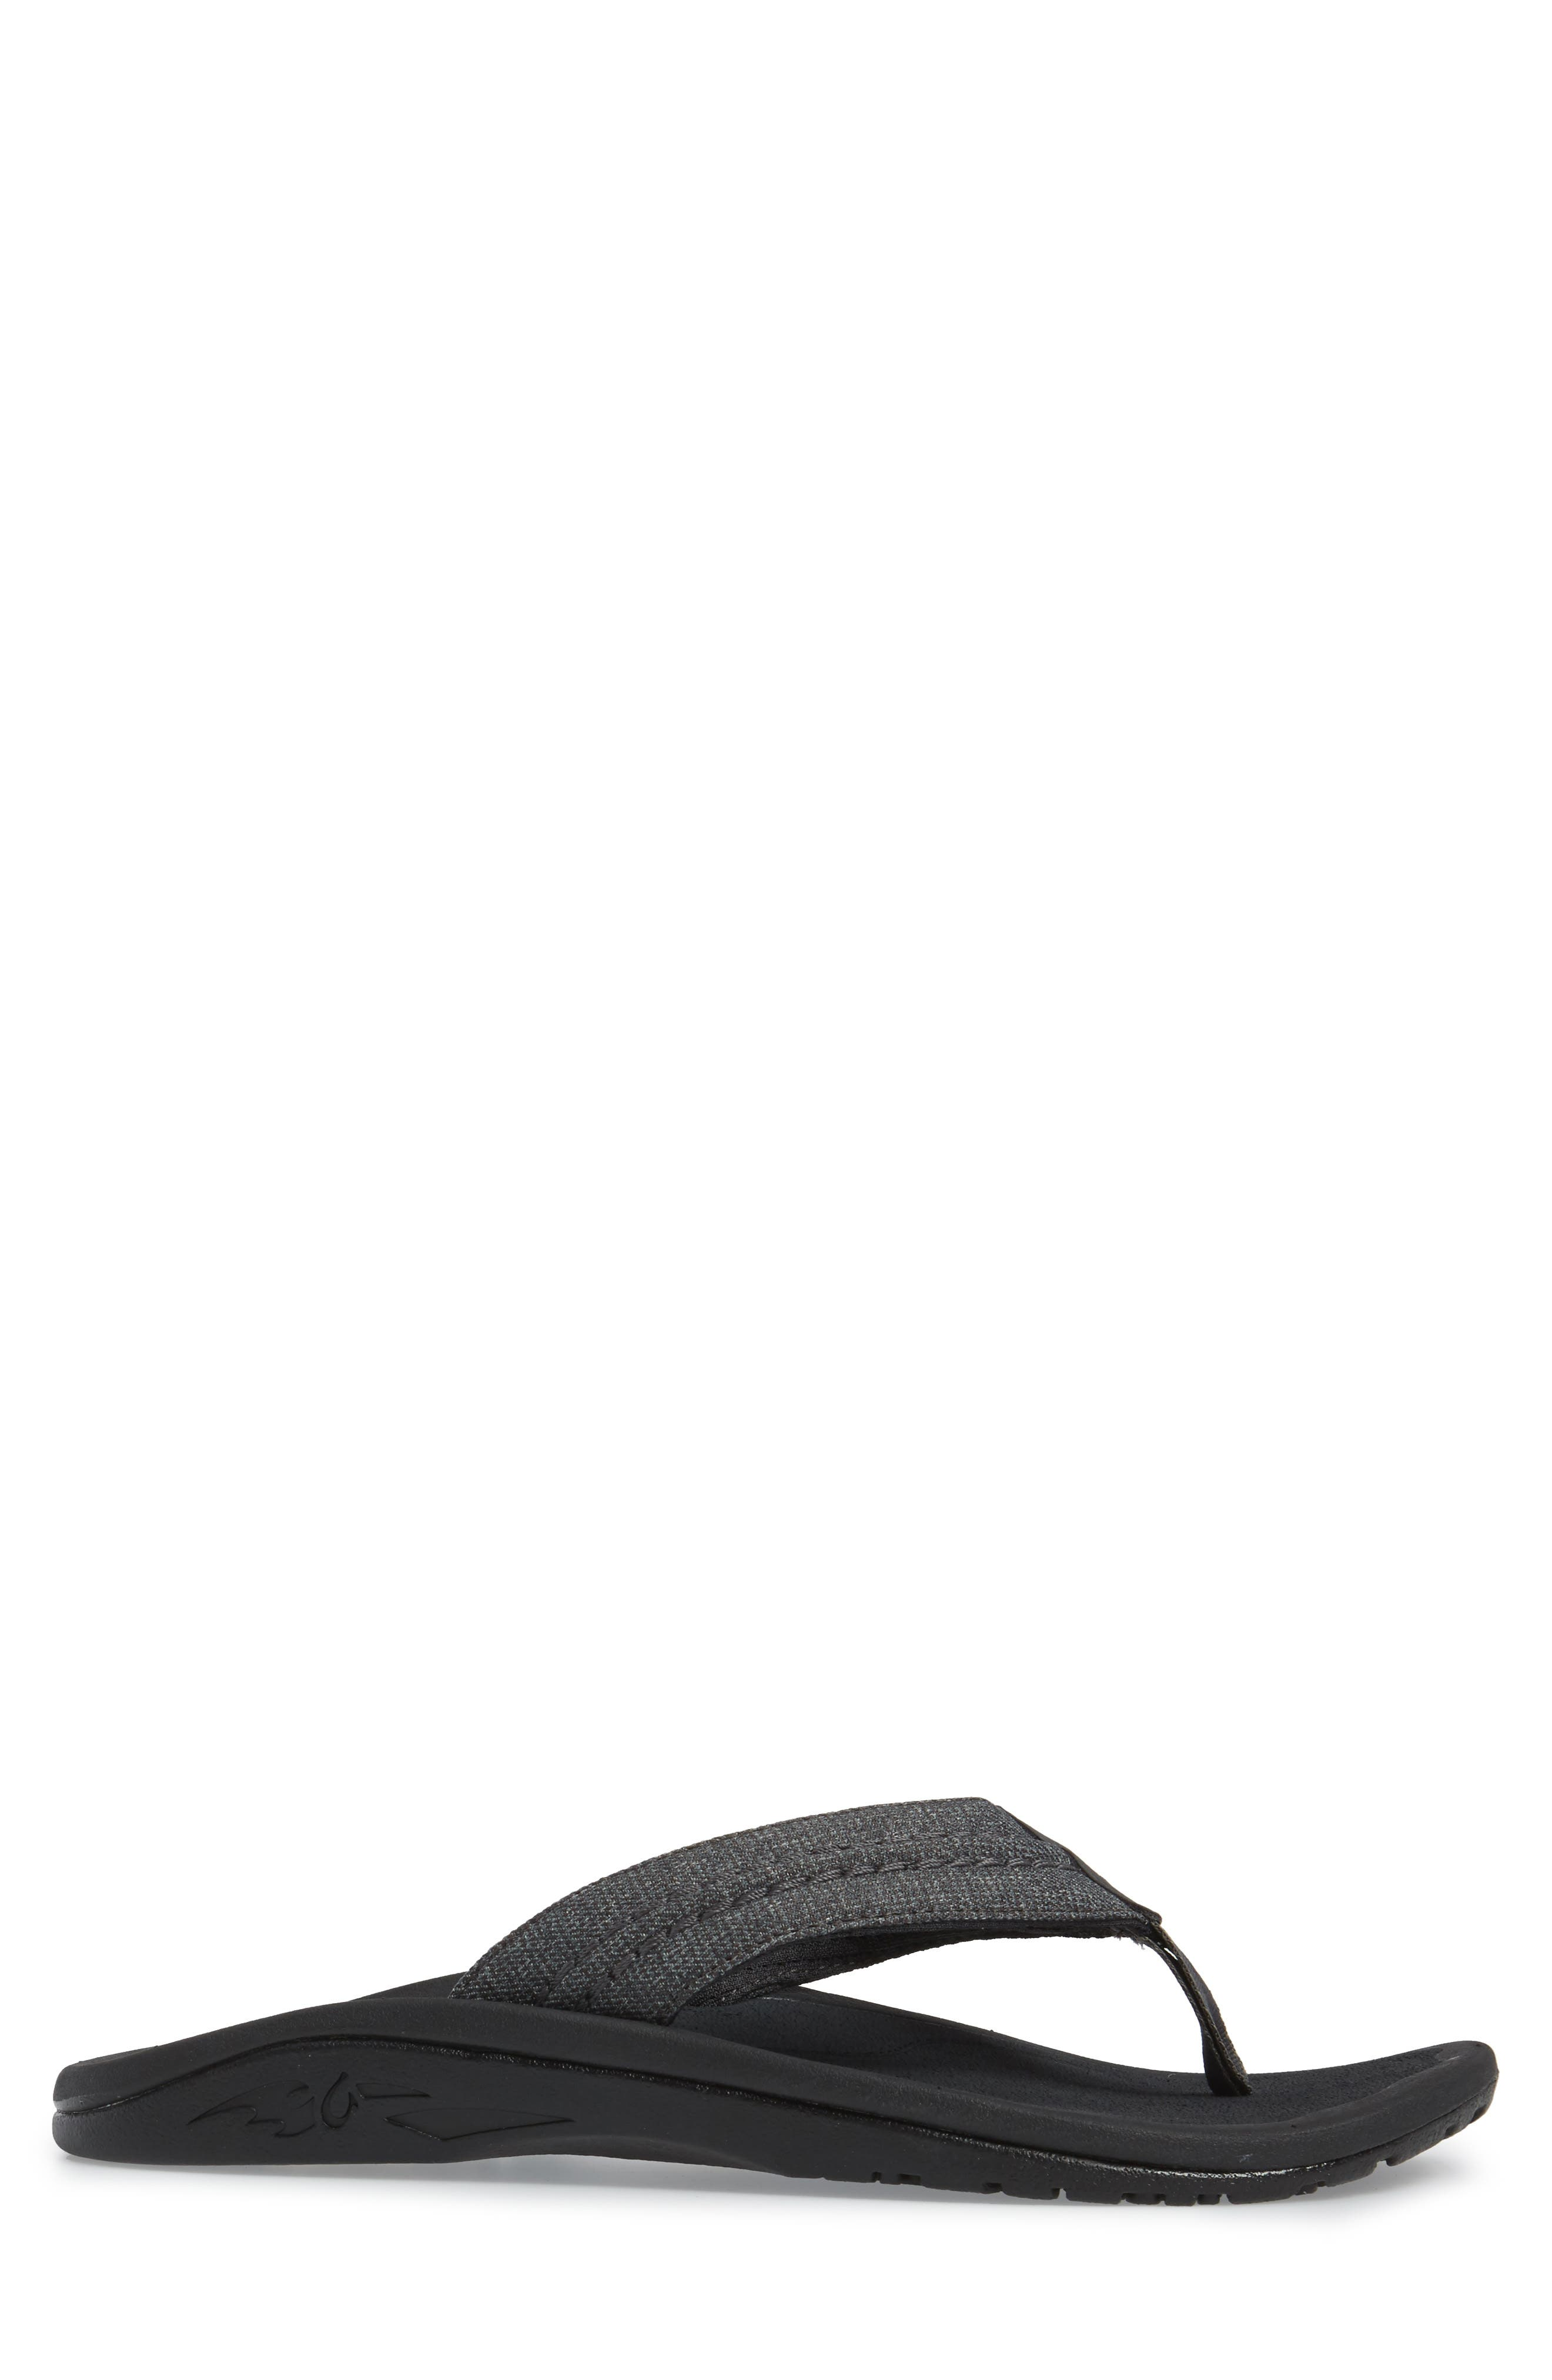 Hokua Flip Flop,                             Alternate thumbnail 3, color,                             DARK SHADOW/ DARK SHADOW